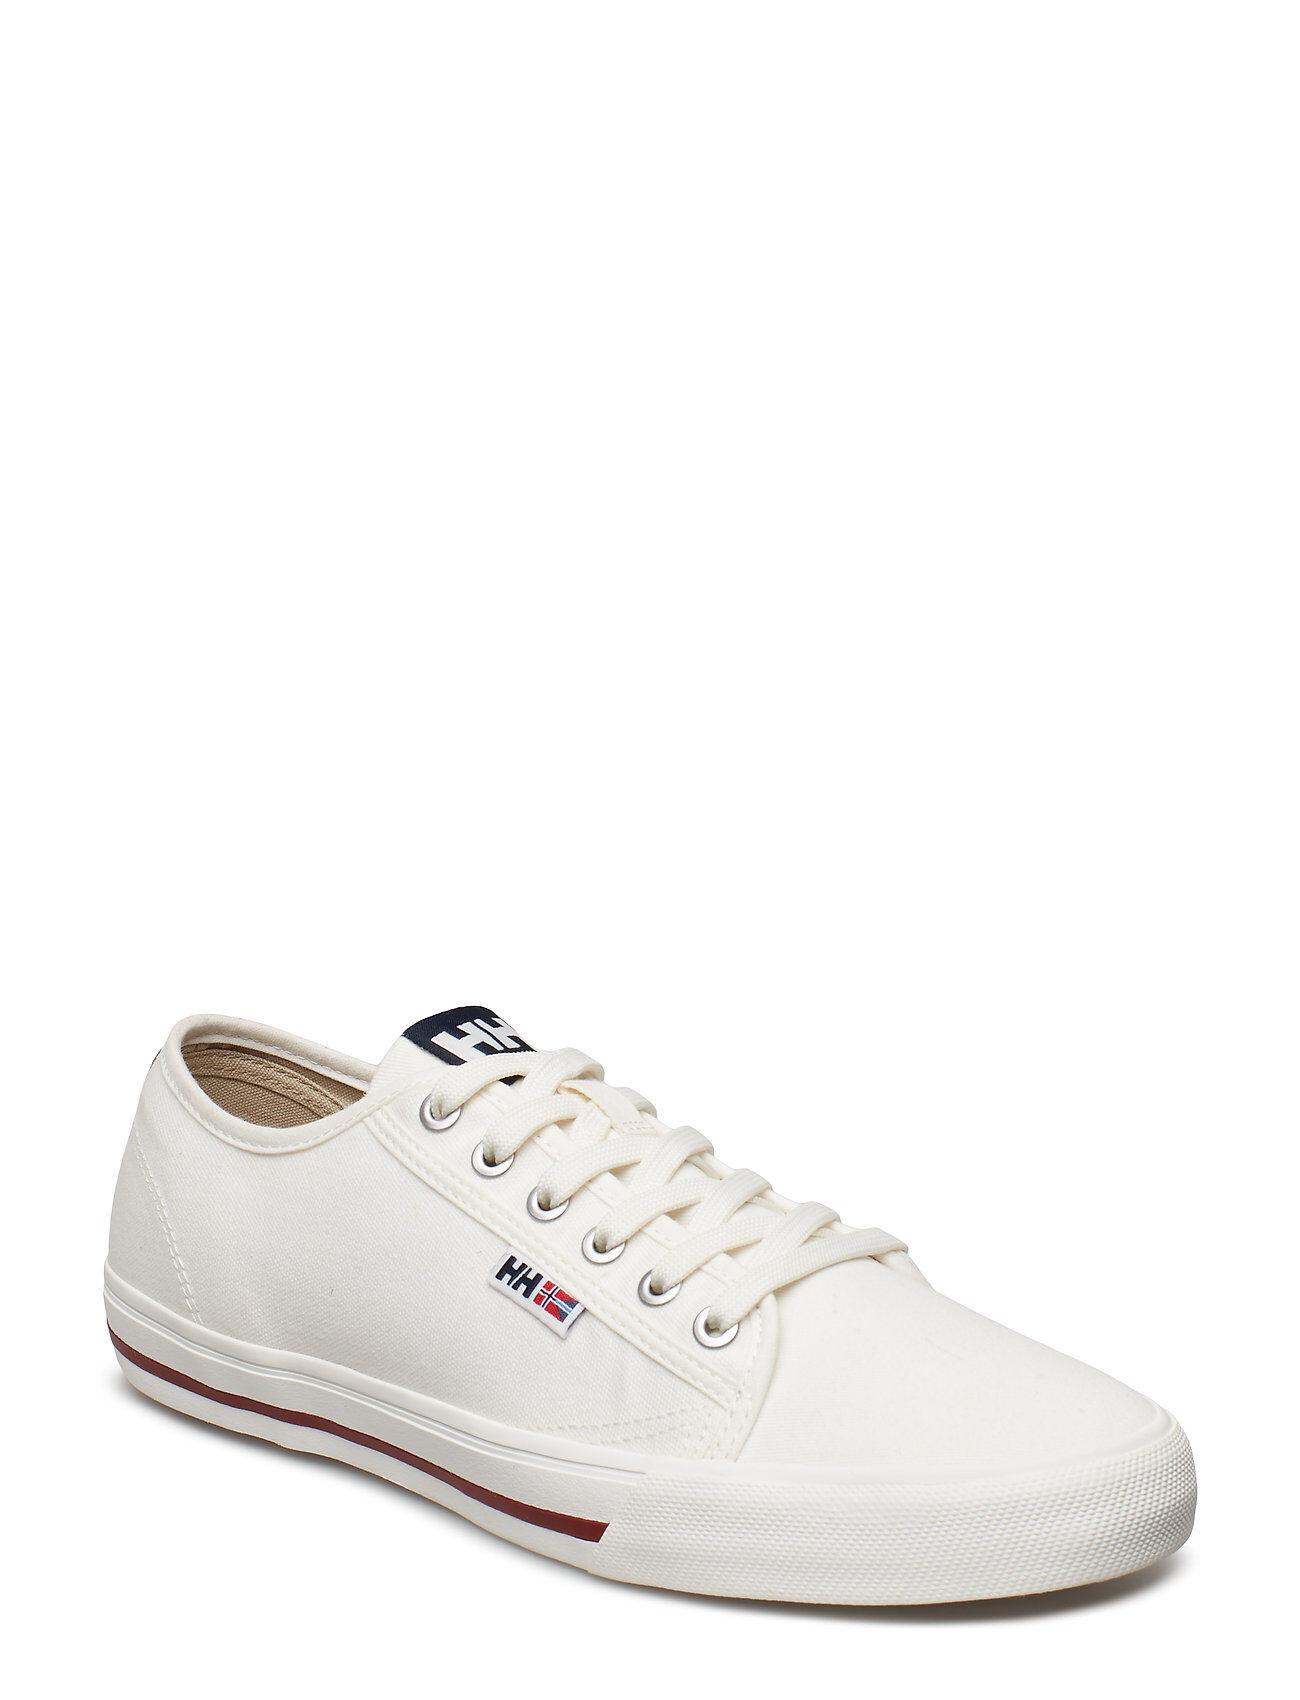 Image of Helly Hansen Fjord Canvas Shoe V2 Matalavartiset Sneakerit Tennarit Valkoinen